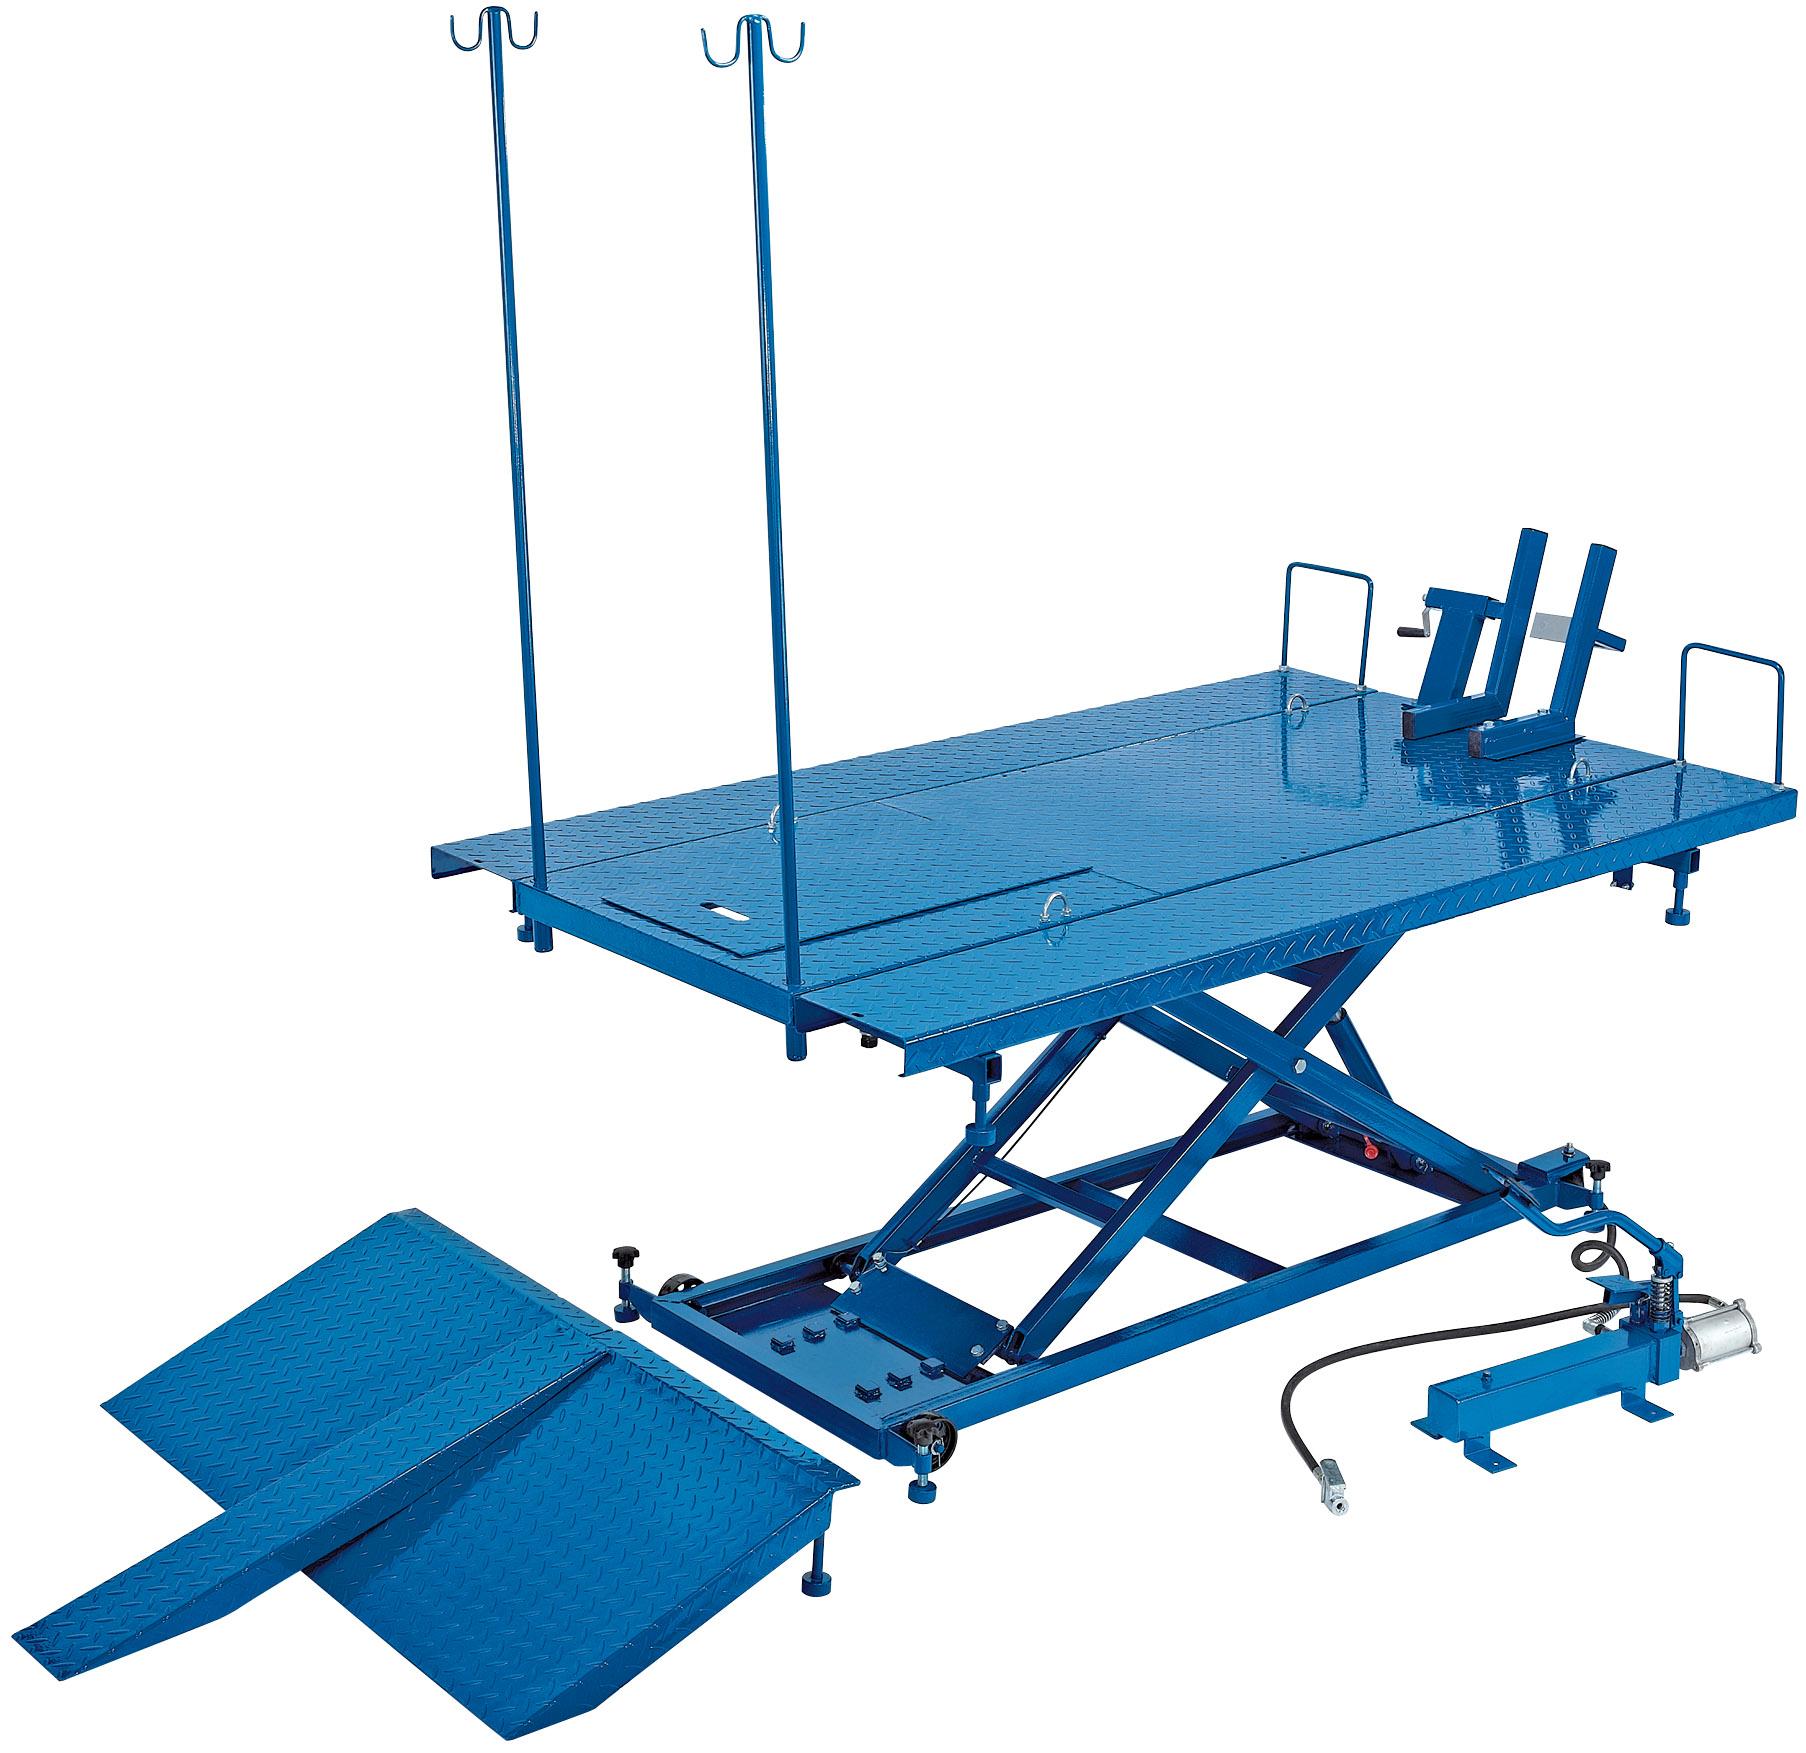 Atv Lift Draper 37190 Mcl4 680kg Pneumatic Hydraulic